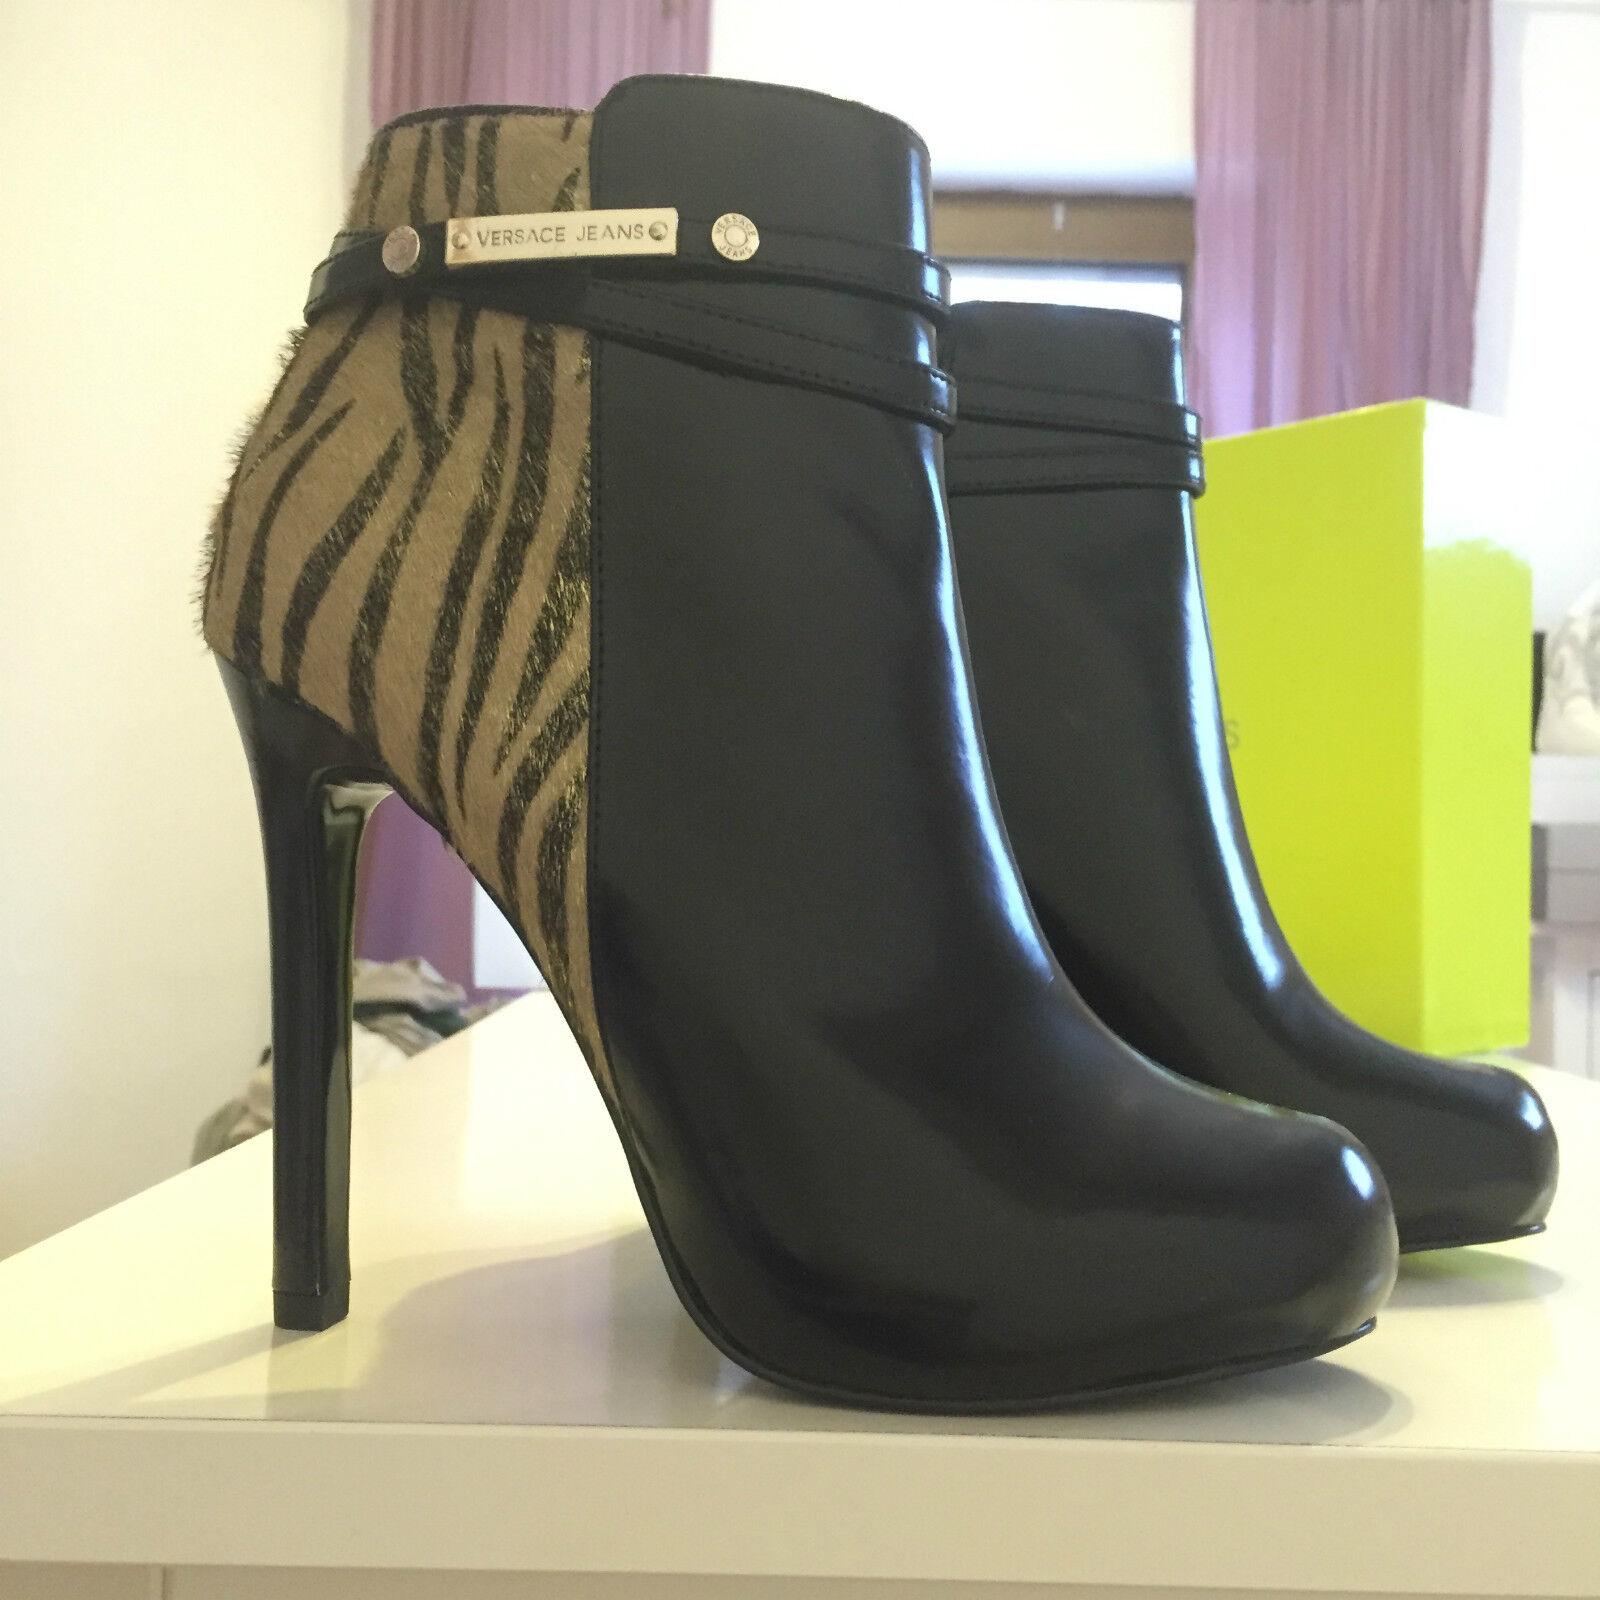 Versace Stiefeletten Stiefel Ankle Boots EUR 39 US 8 UK 6 neu